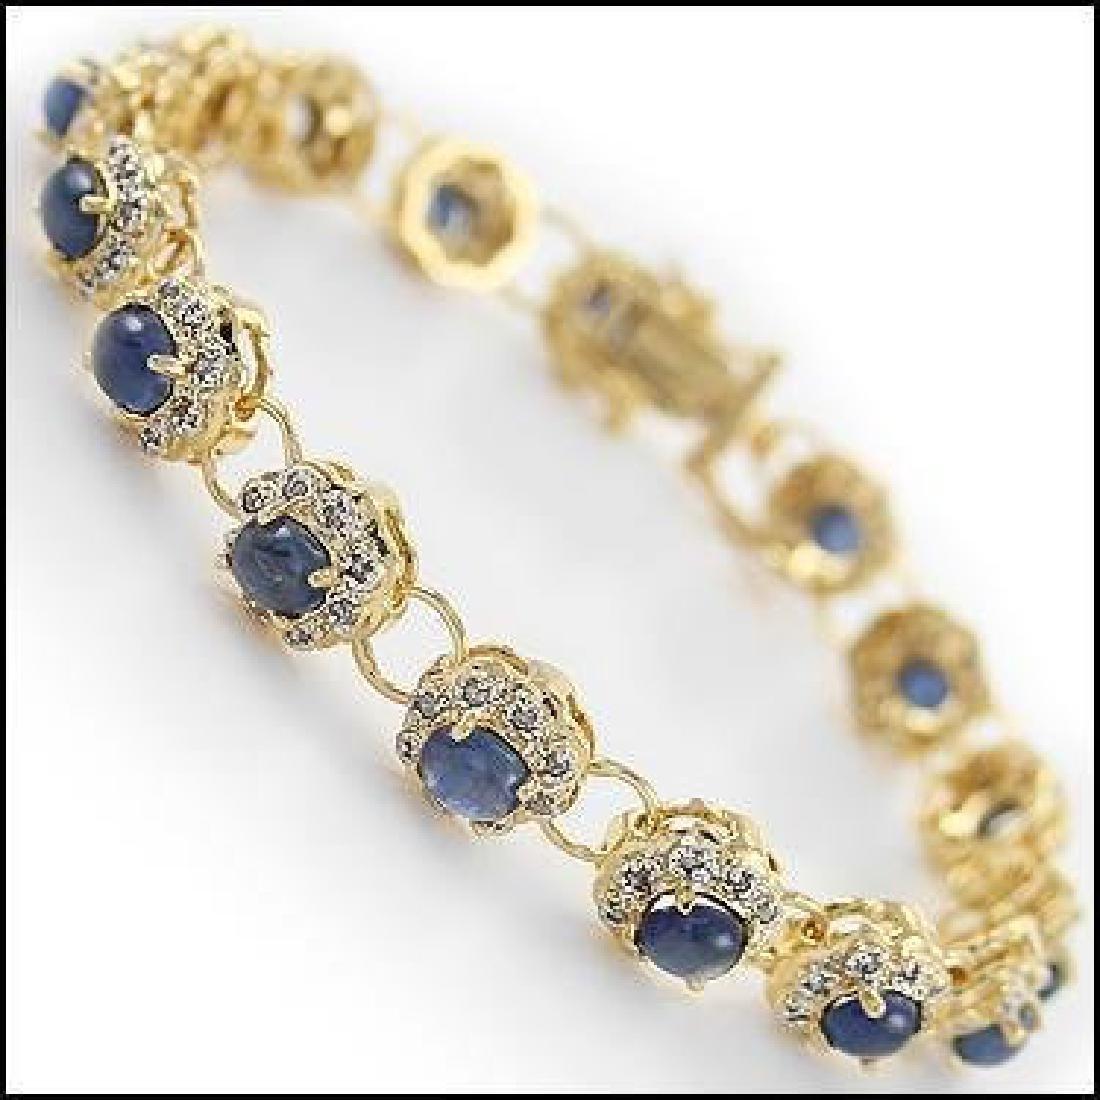 15.35 Sapphire & Diamond Designer Bracelet MSRP $1495